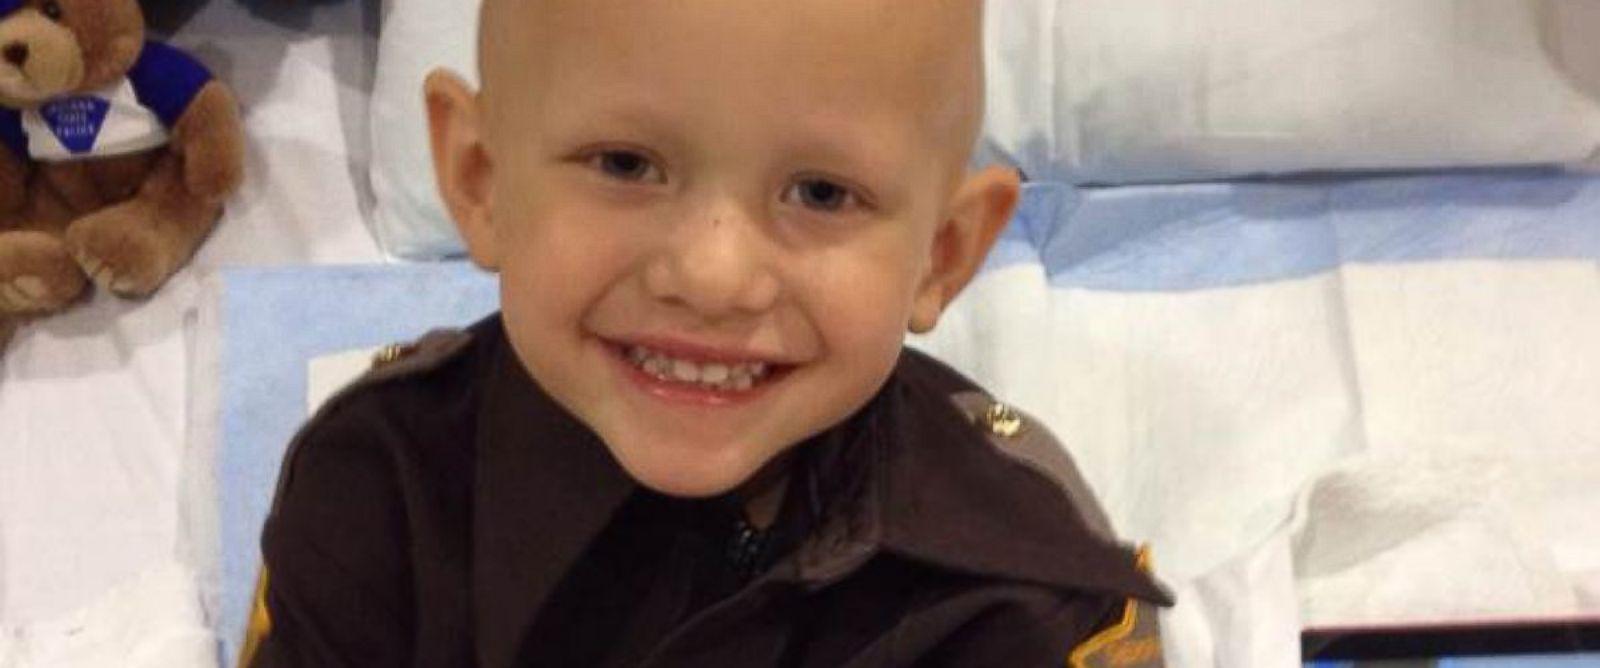 PHOTO: Wyatt Schmaltz, 3, is being treated for aggressive stage 4 cancer.